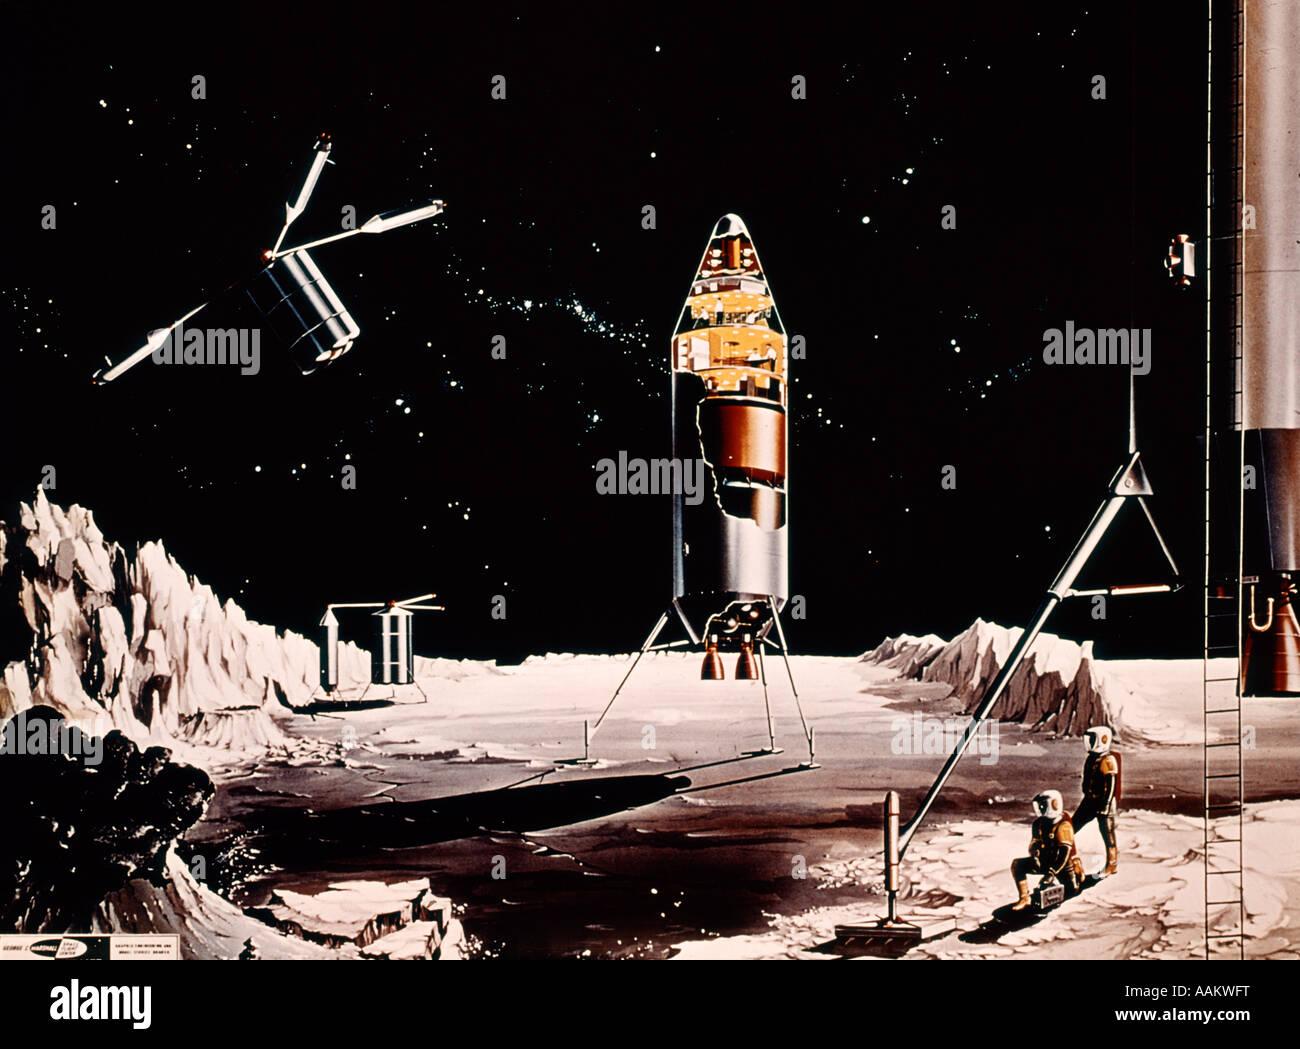 1960s FANTASY ILLUSTRATION LUNAR LANDING EXPLORATION MOON ASTRONAUTS SATELLITE ROCKET SCI-FI SCIENCE FICTION Stock Photo